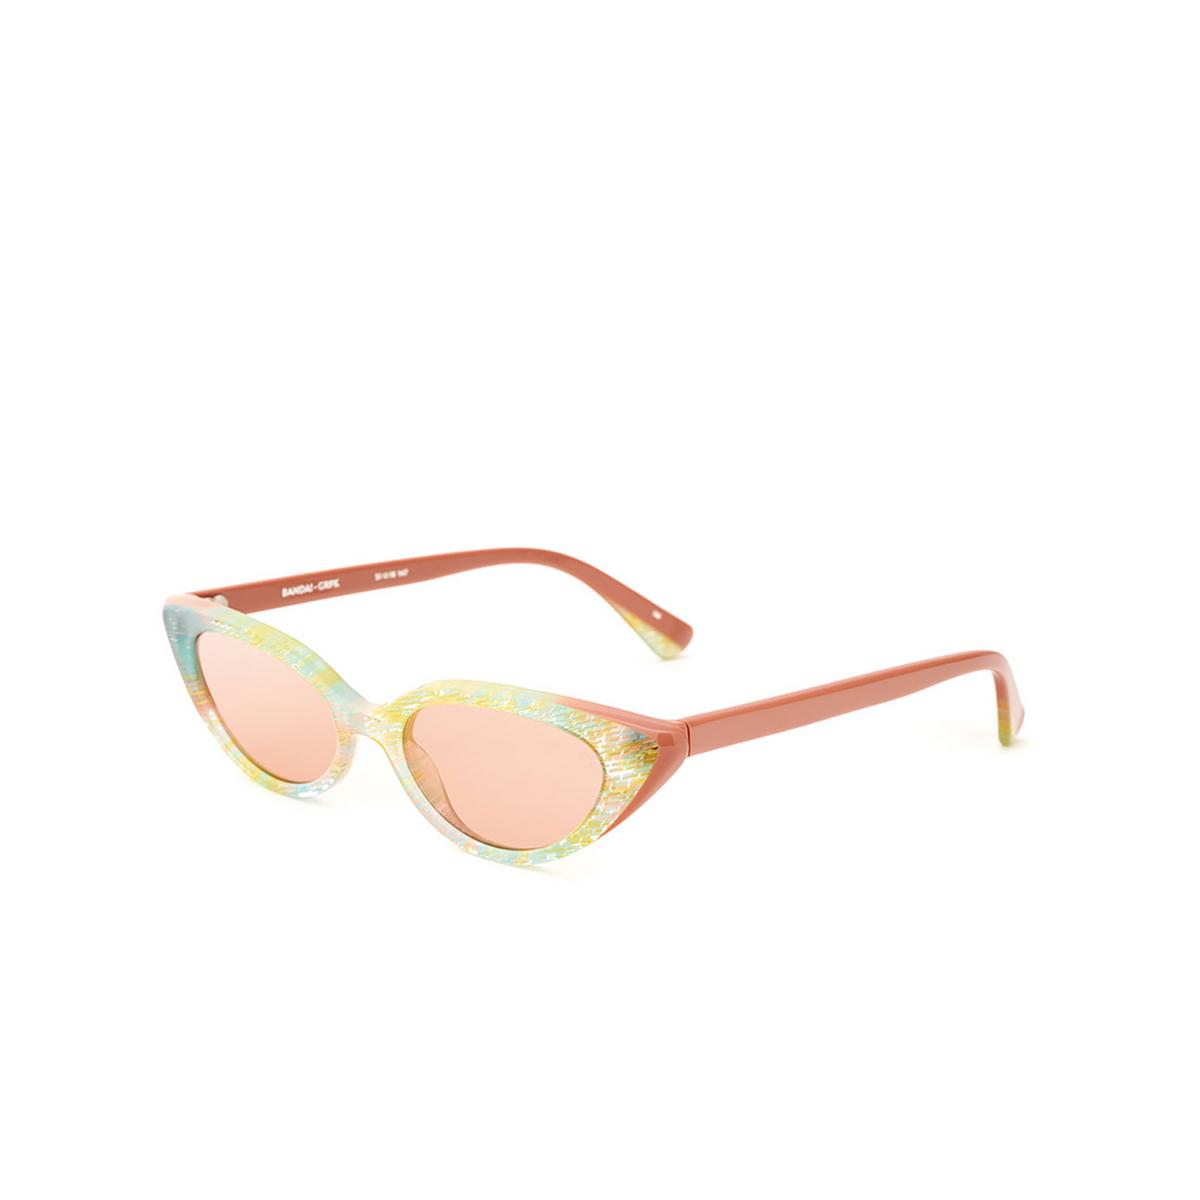 Etnia Barcelona® Cat-eye Sunglasses: Bandai color Grpk.